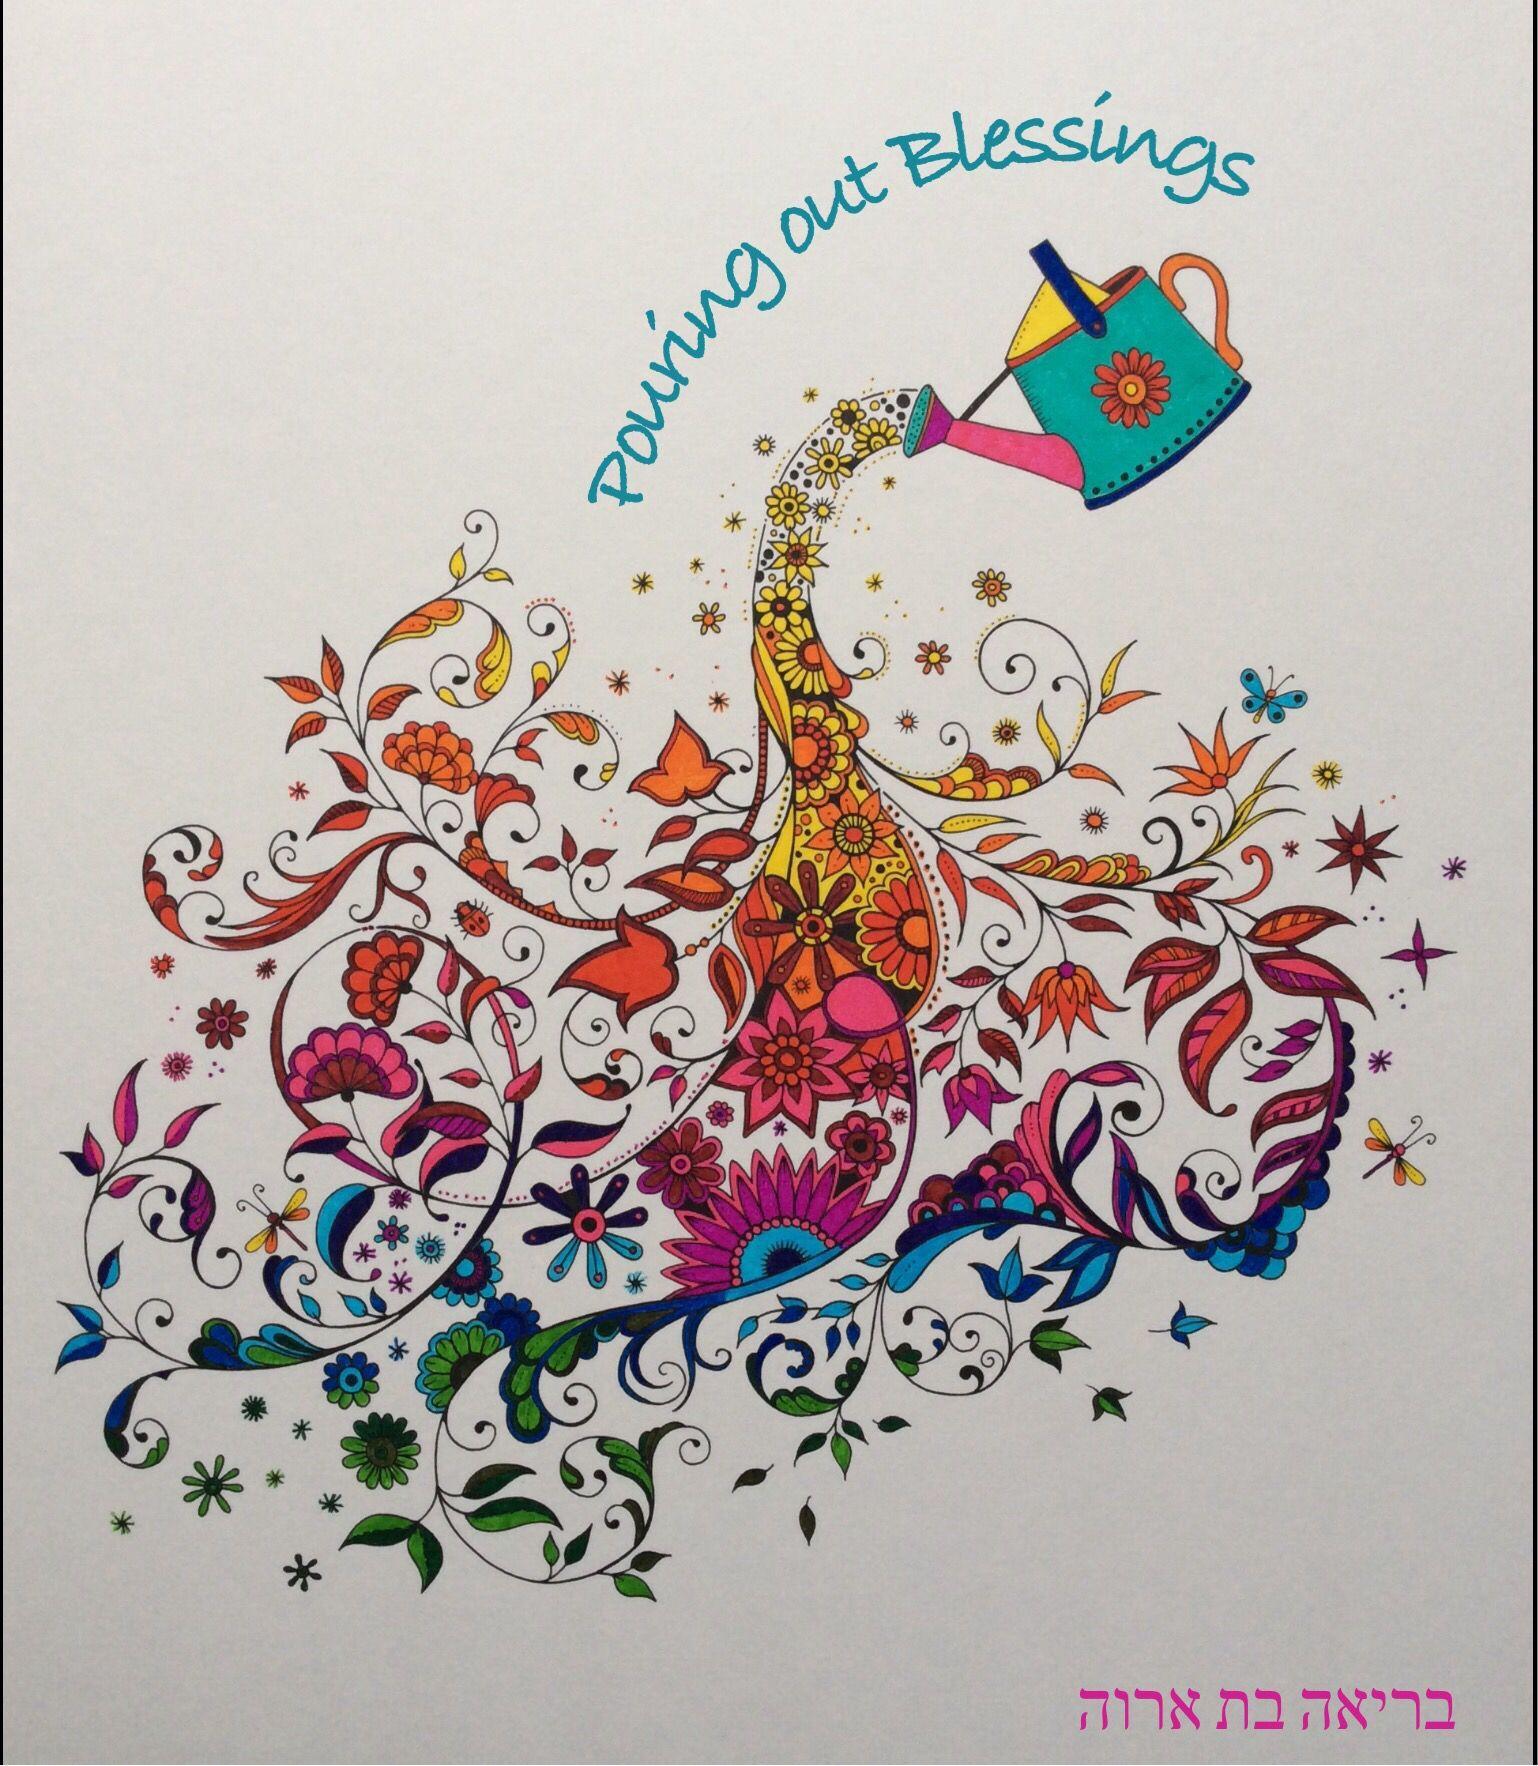 Secret Garden Artist Edition Staedtler Pens Briah Bat Aryeh 5 Ideas For The Vi Secret Garden Coloring Book Johanna Basford Coloring Book Staedtler Pens